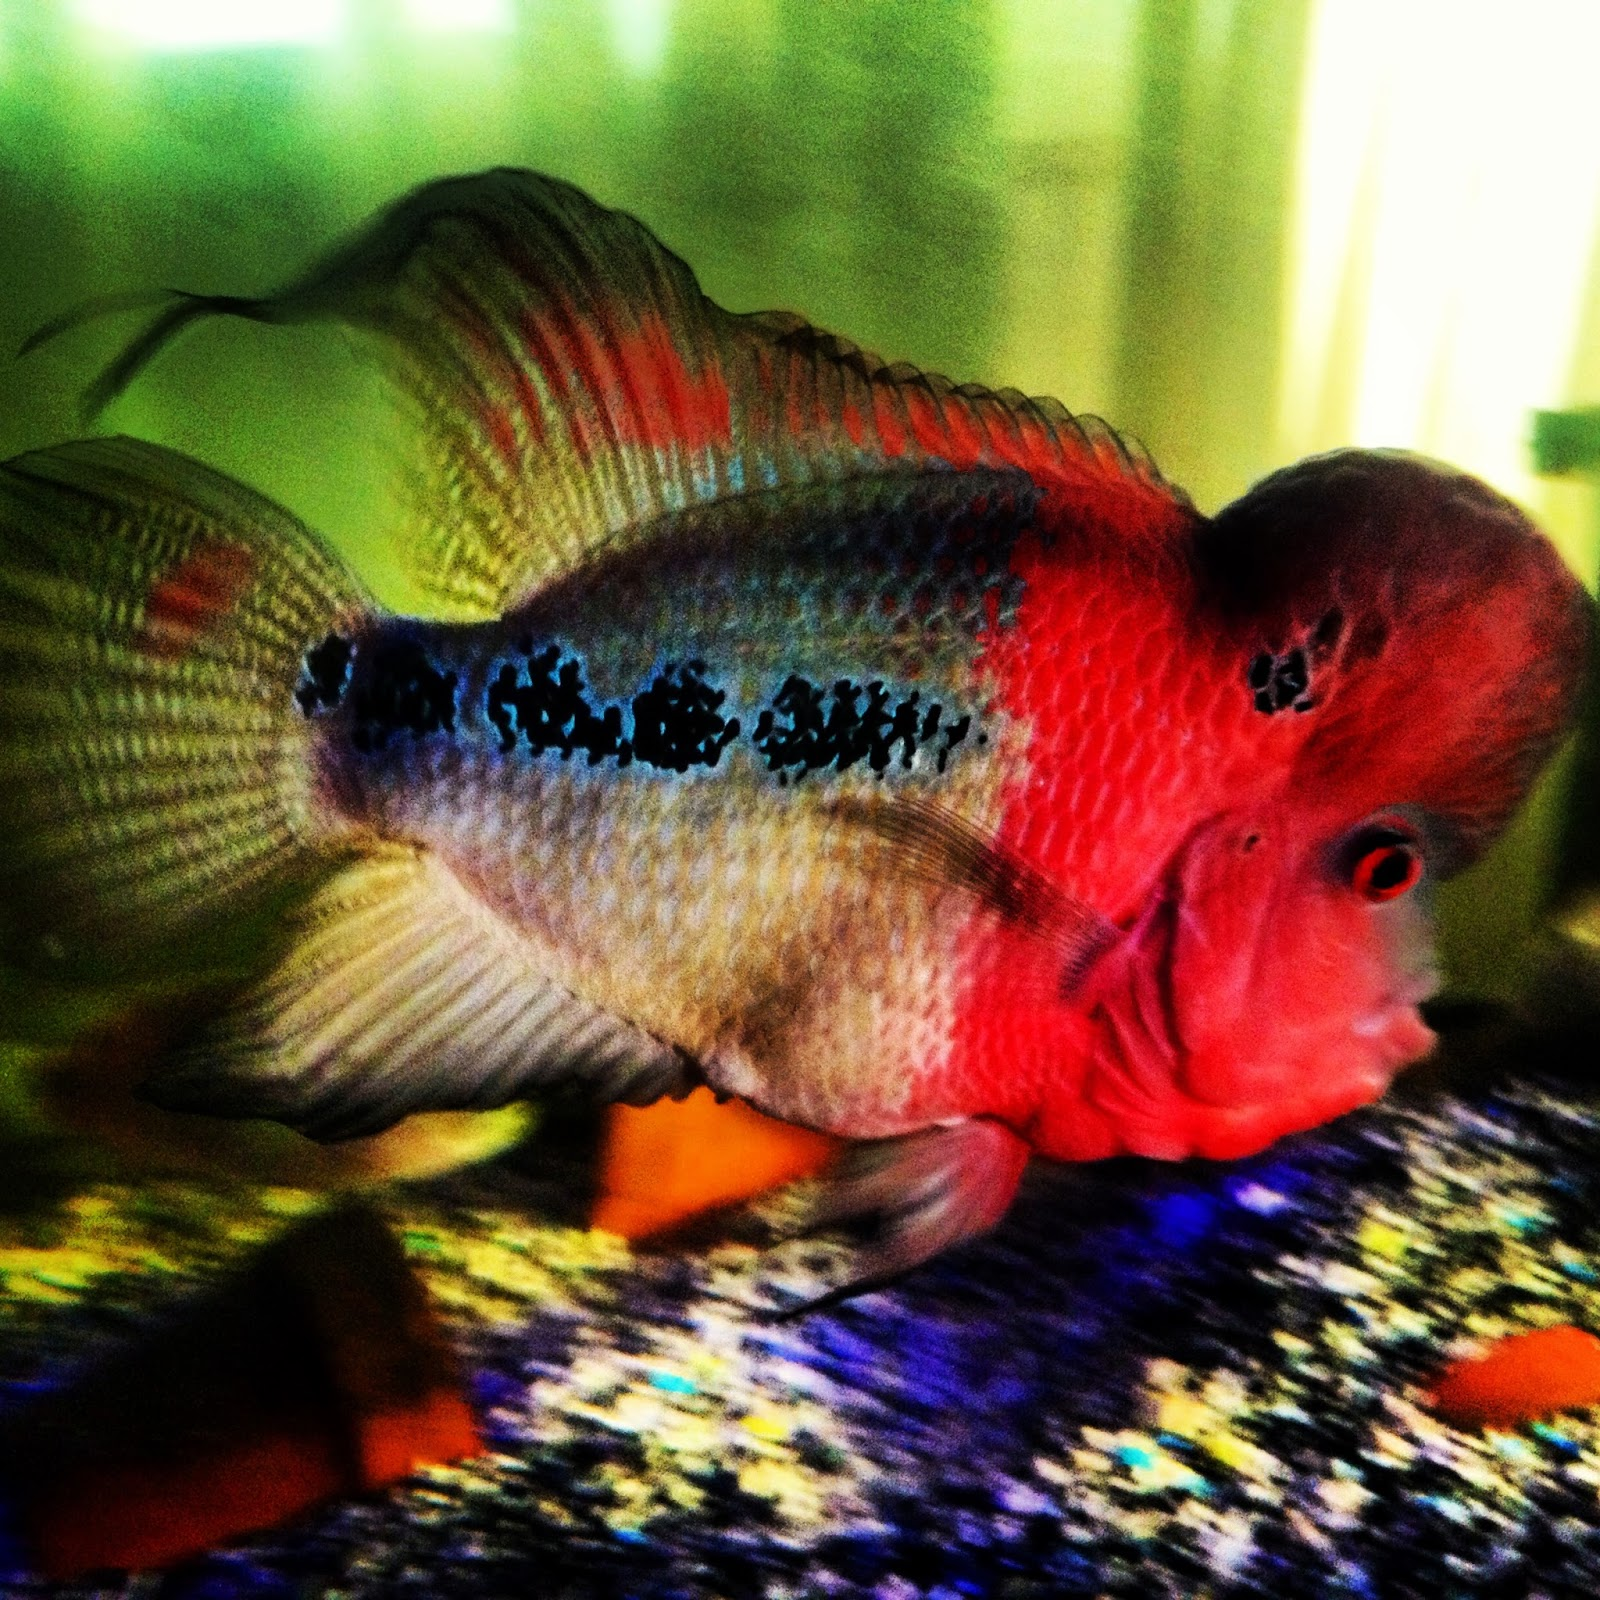 My Pets....: Super Red Dragon Flowerhorn